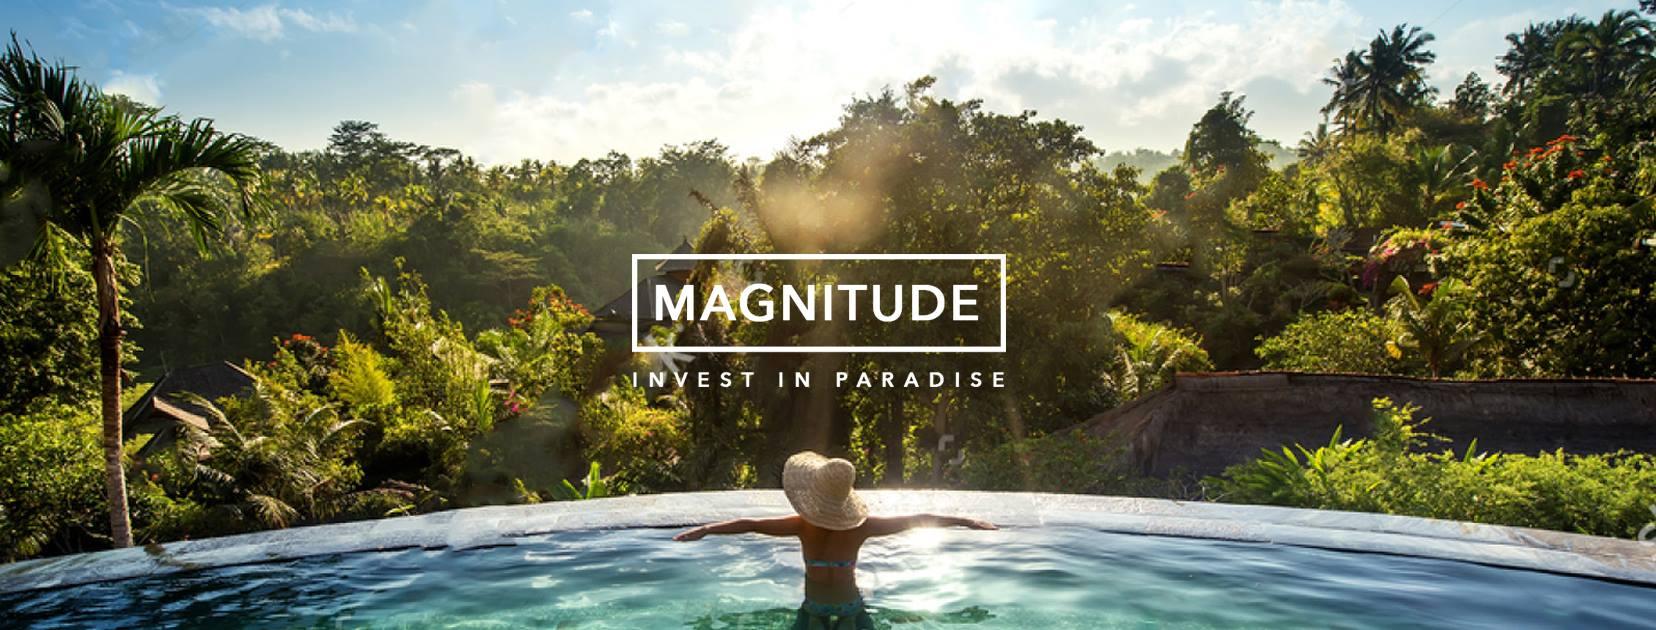 Magnitude Image